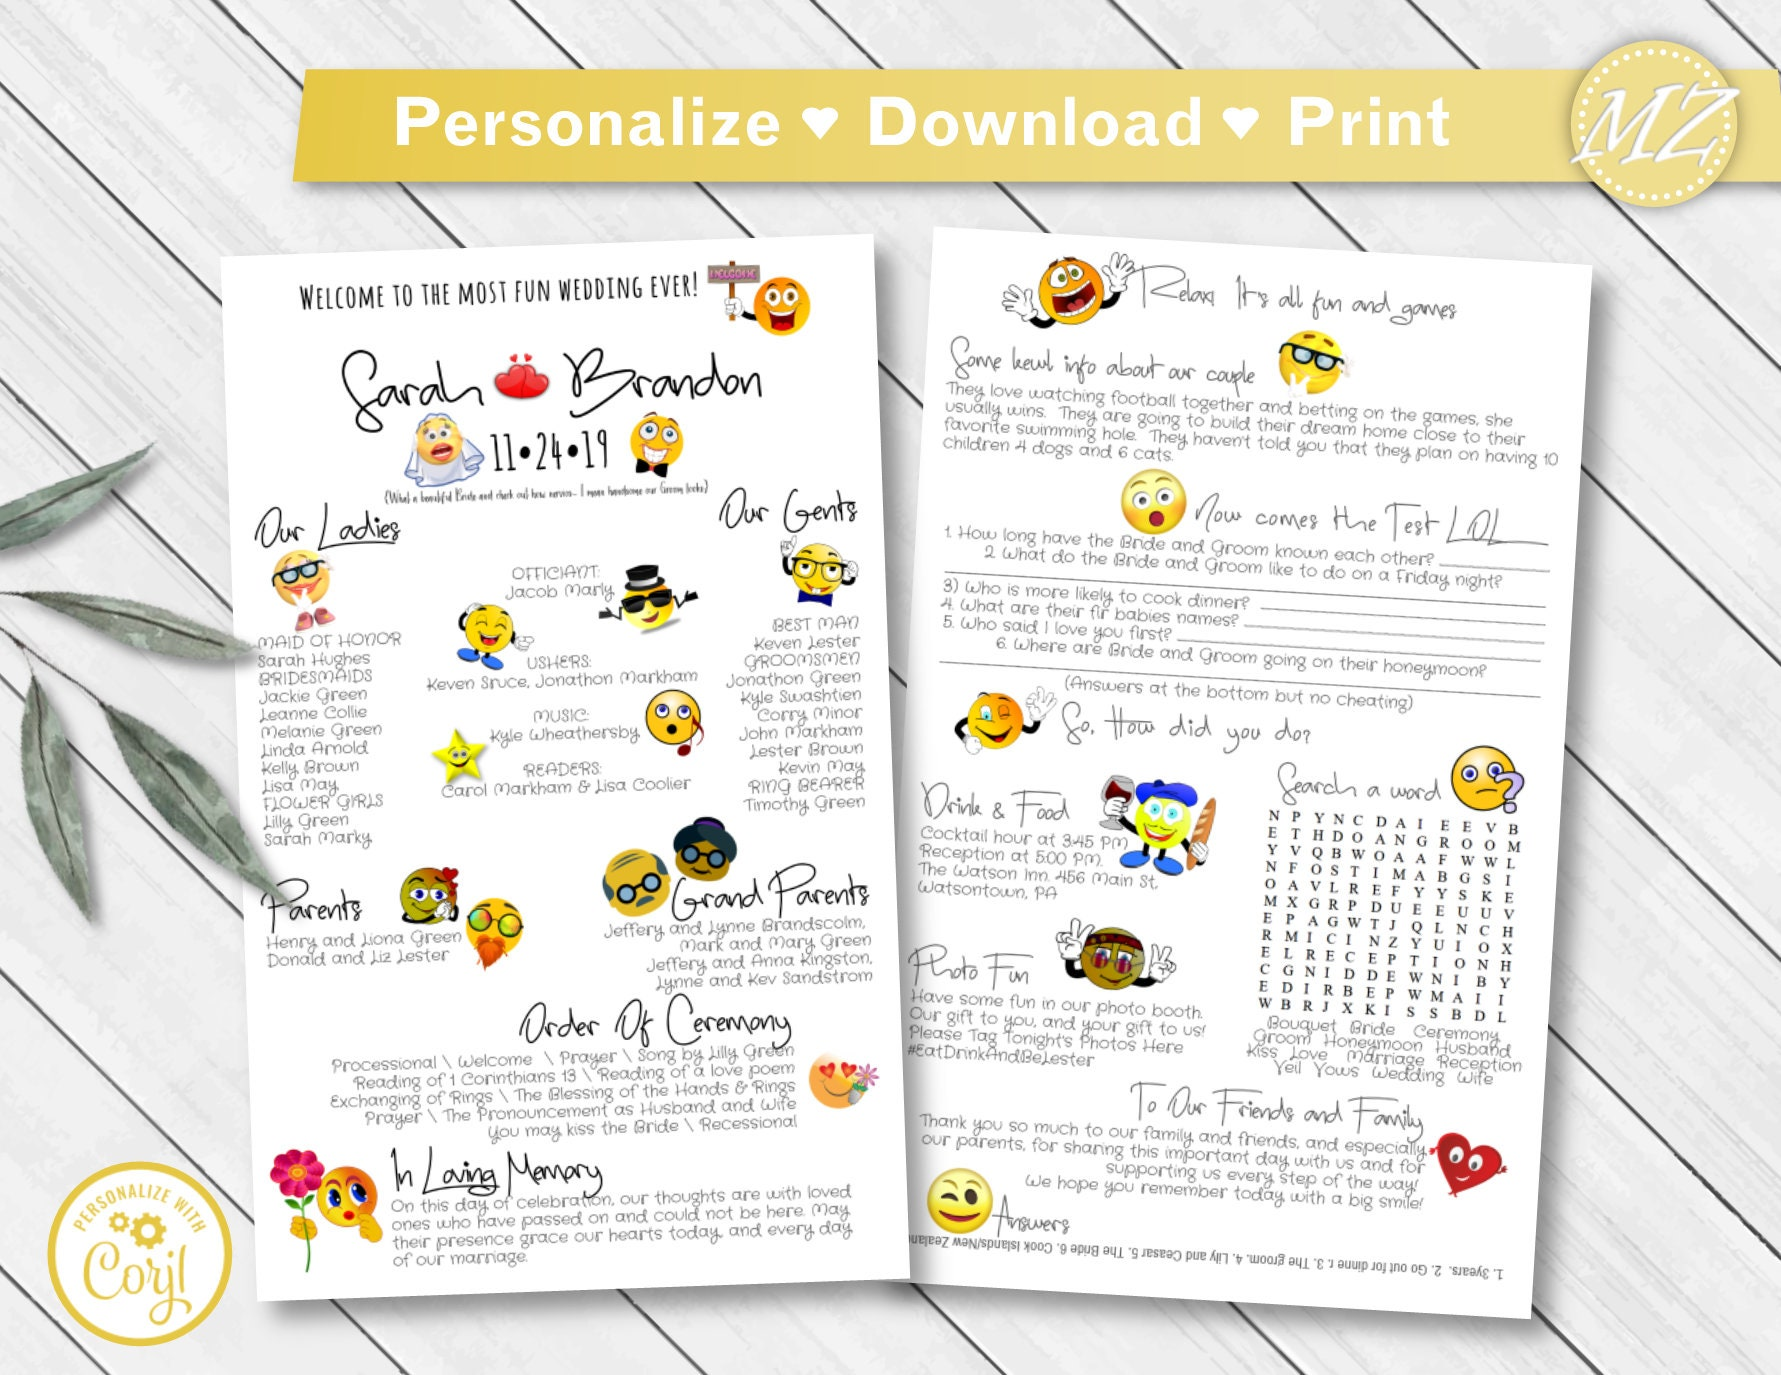 FUN Customizable Wedding Program - 5x8 2 sides - Unique Smiley Emoji  Emoticon Infographic Games - Instant Download Template - Recolorable!